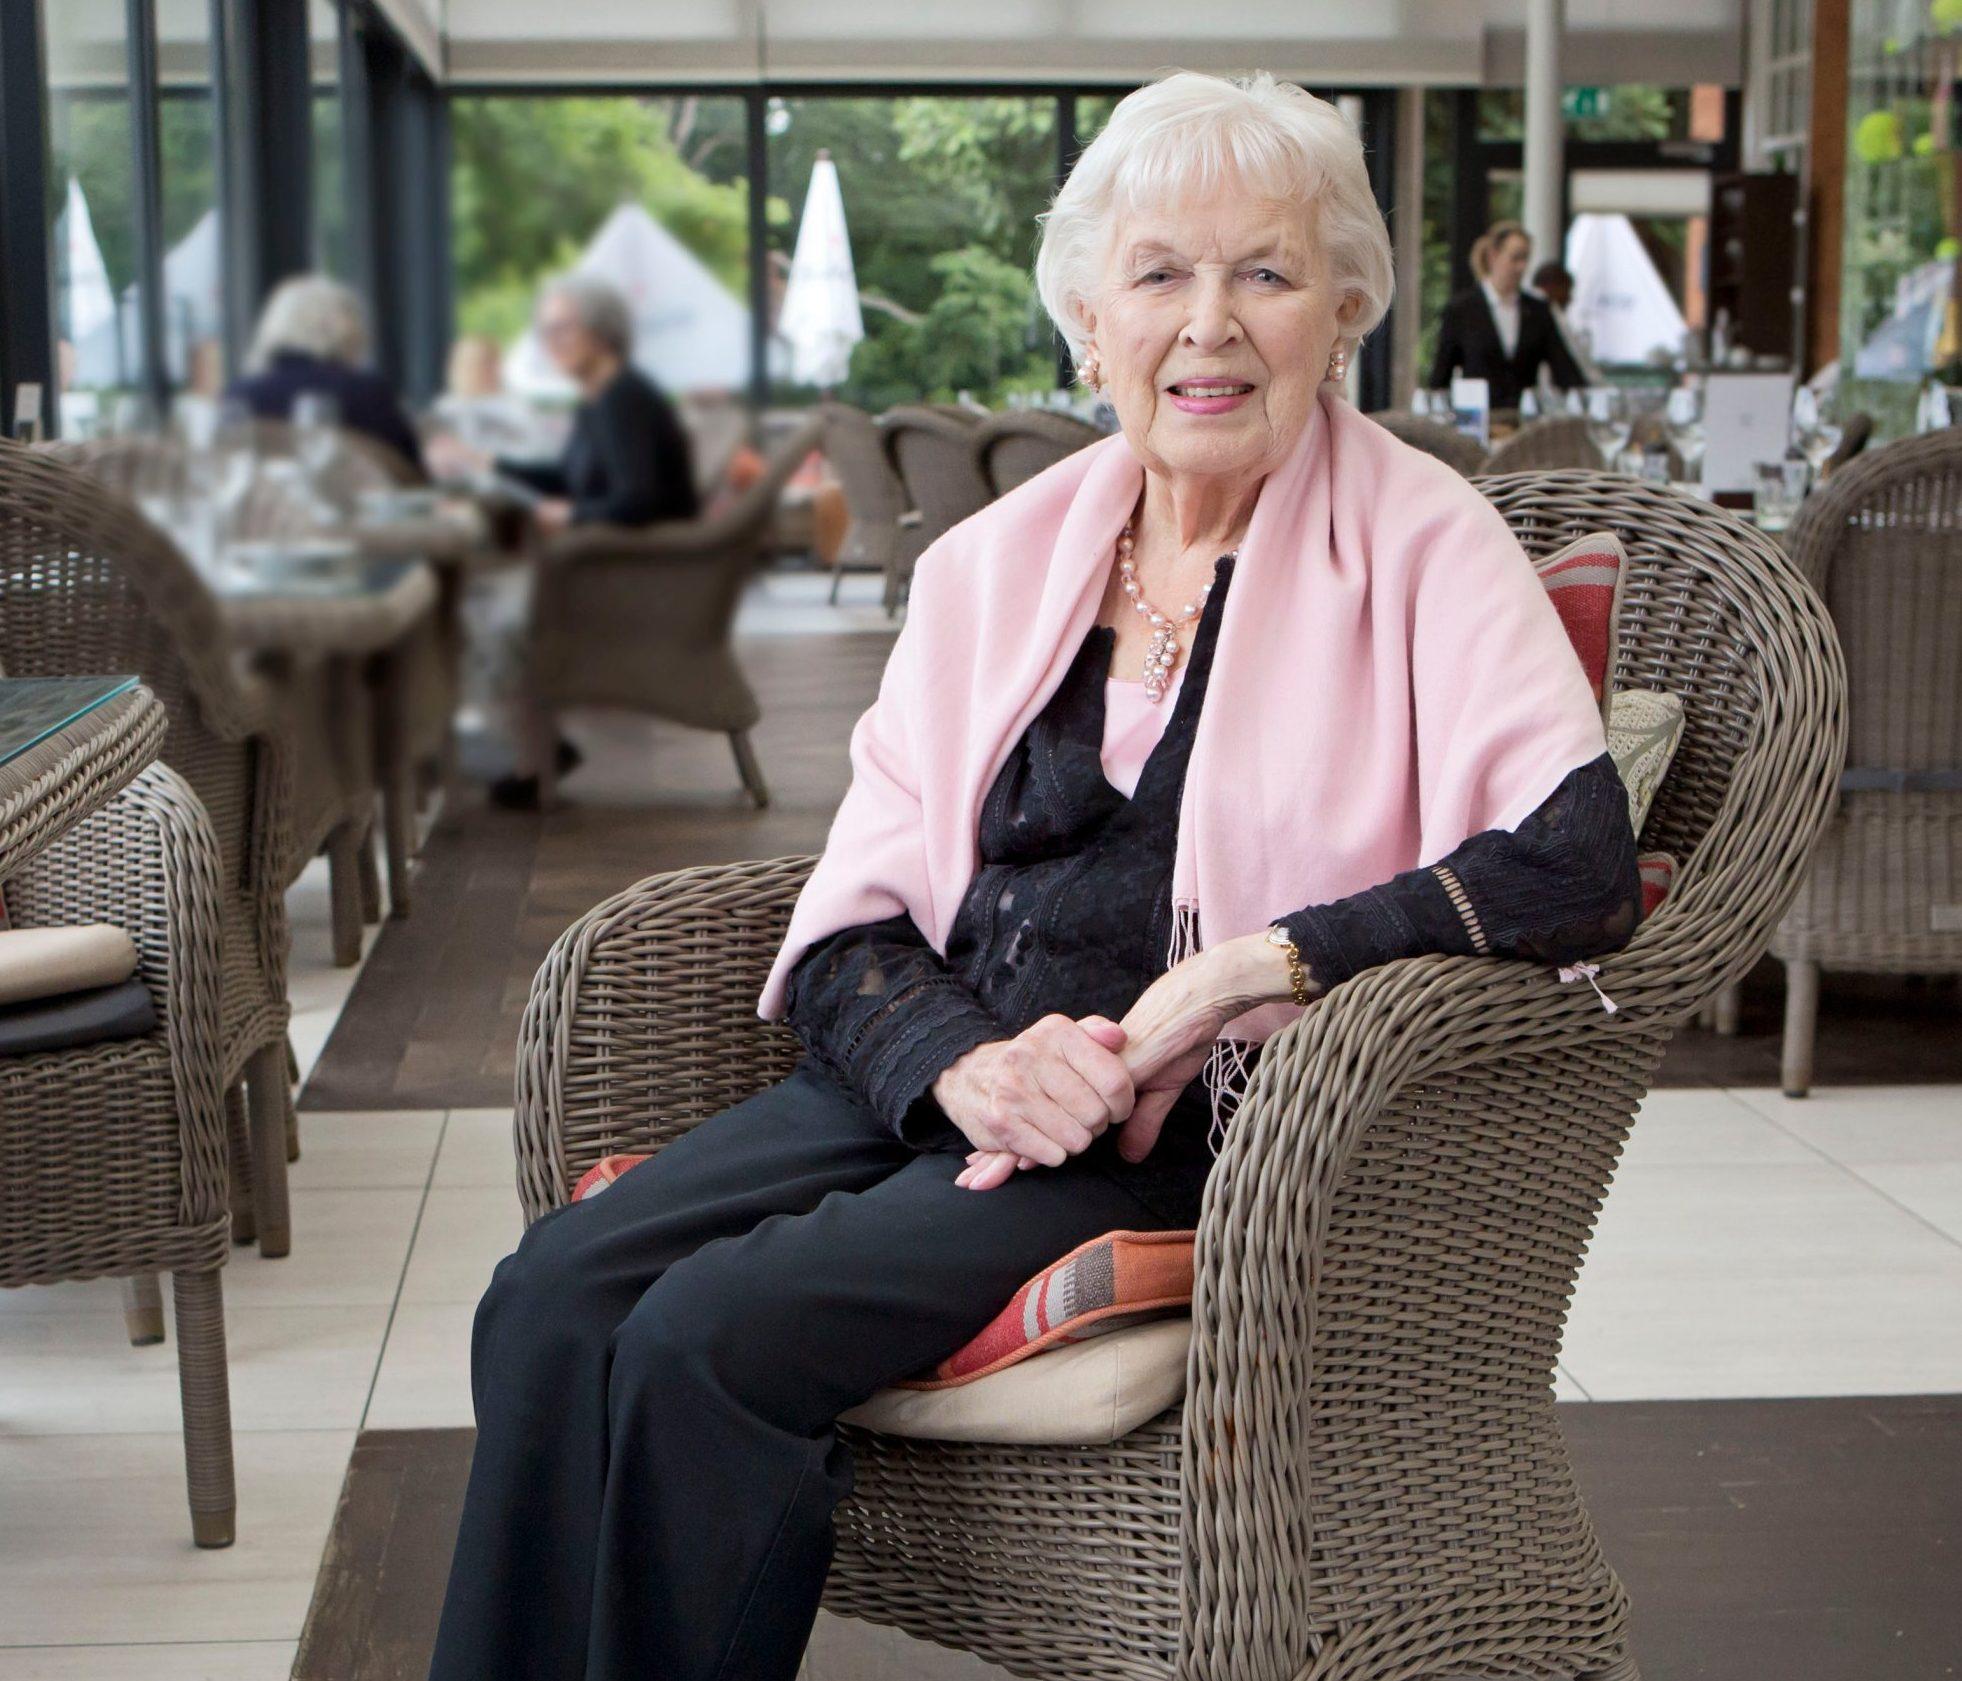 Mandatory Credit: Photo by Jenny Goodall/ANL/REX/Shutterstock (9866595a) Actress Dame June Whitfield. Actress Dame June Whitfield.